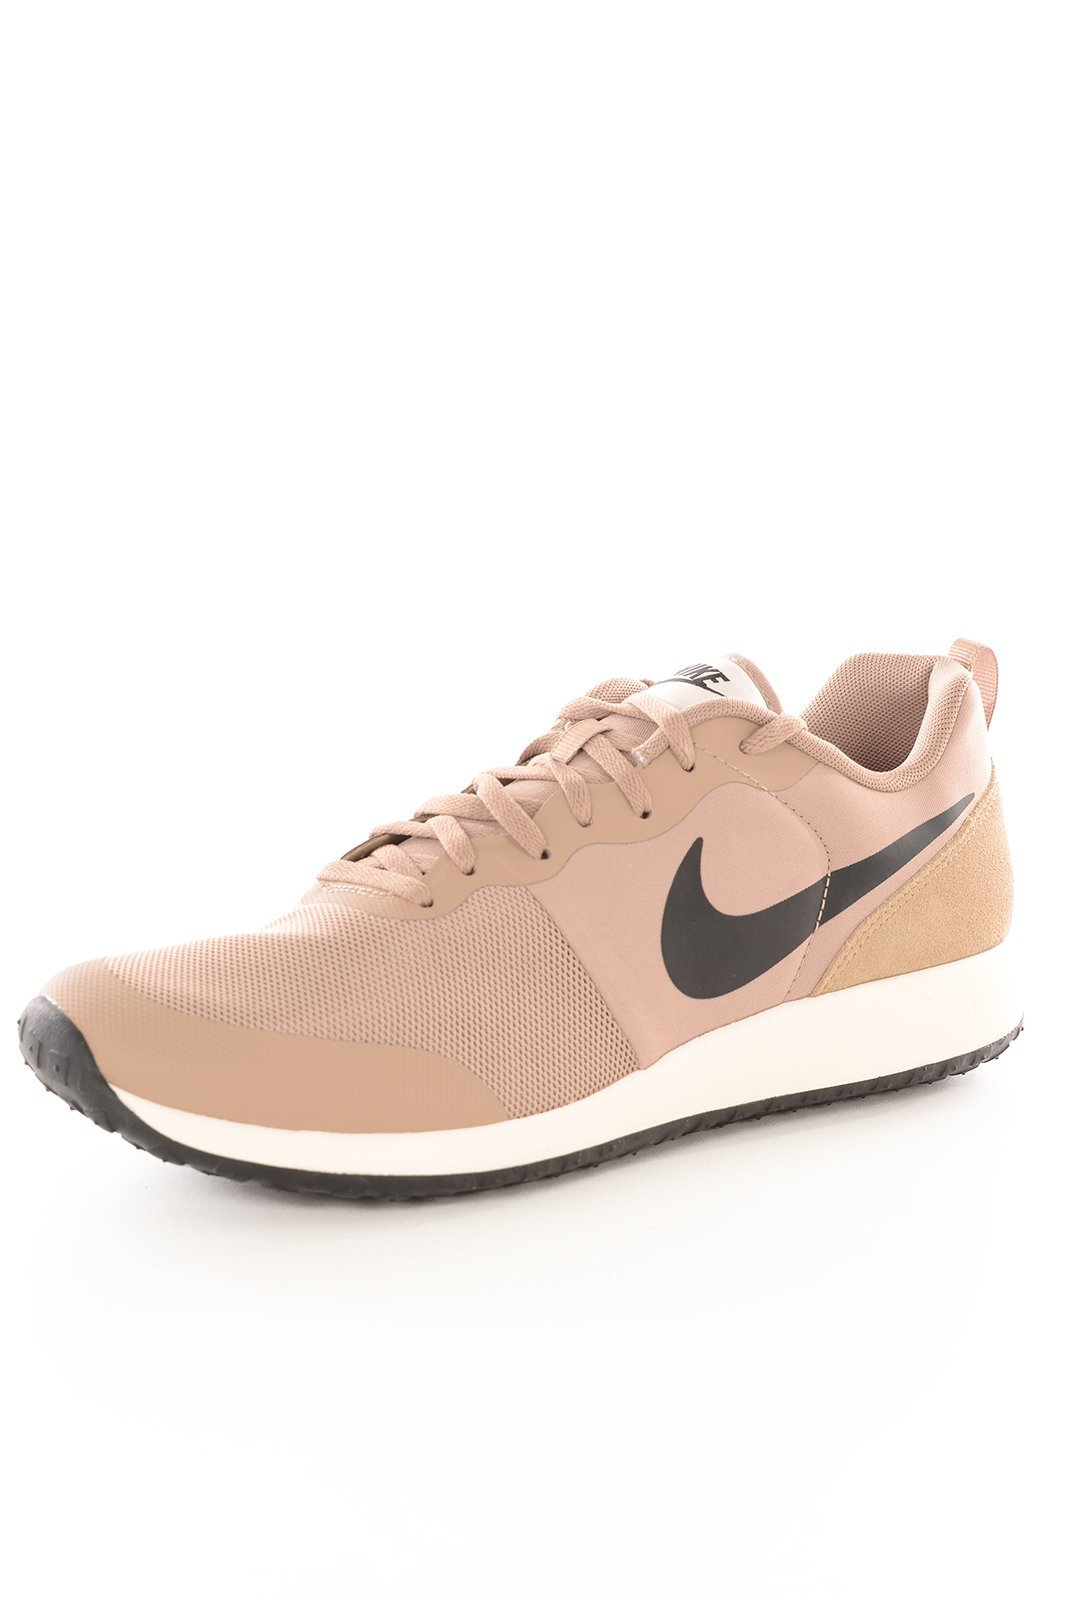 new product c672d d3722 Nike Elite Shinsen Mens Cross Training Shoes 10.5 D - Medium